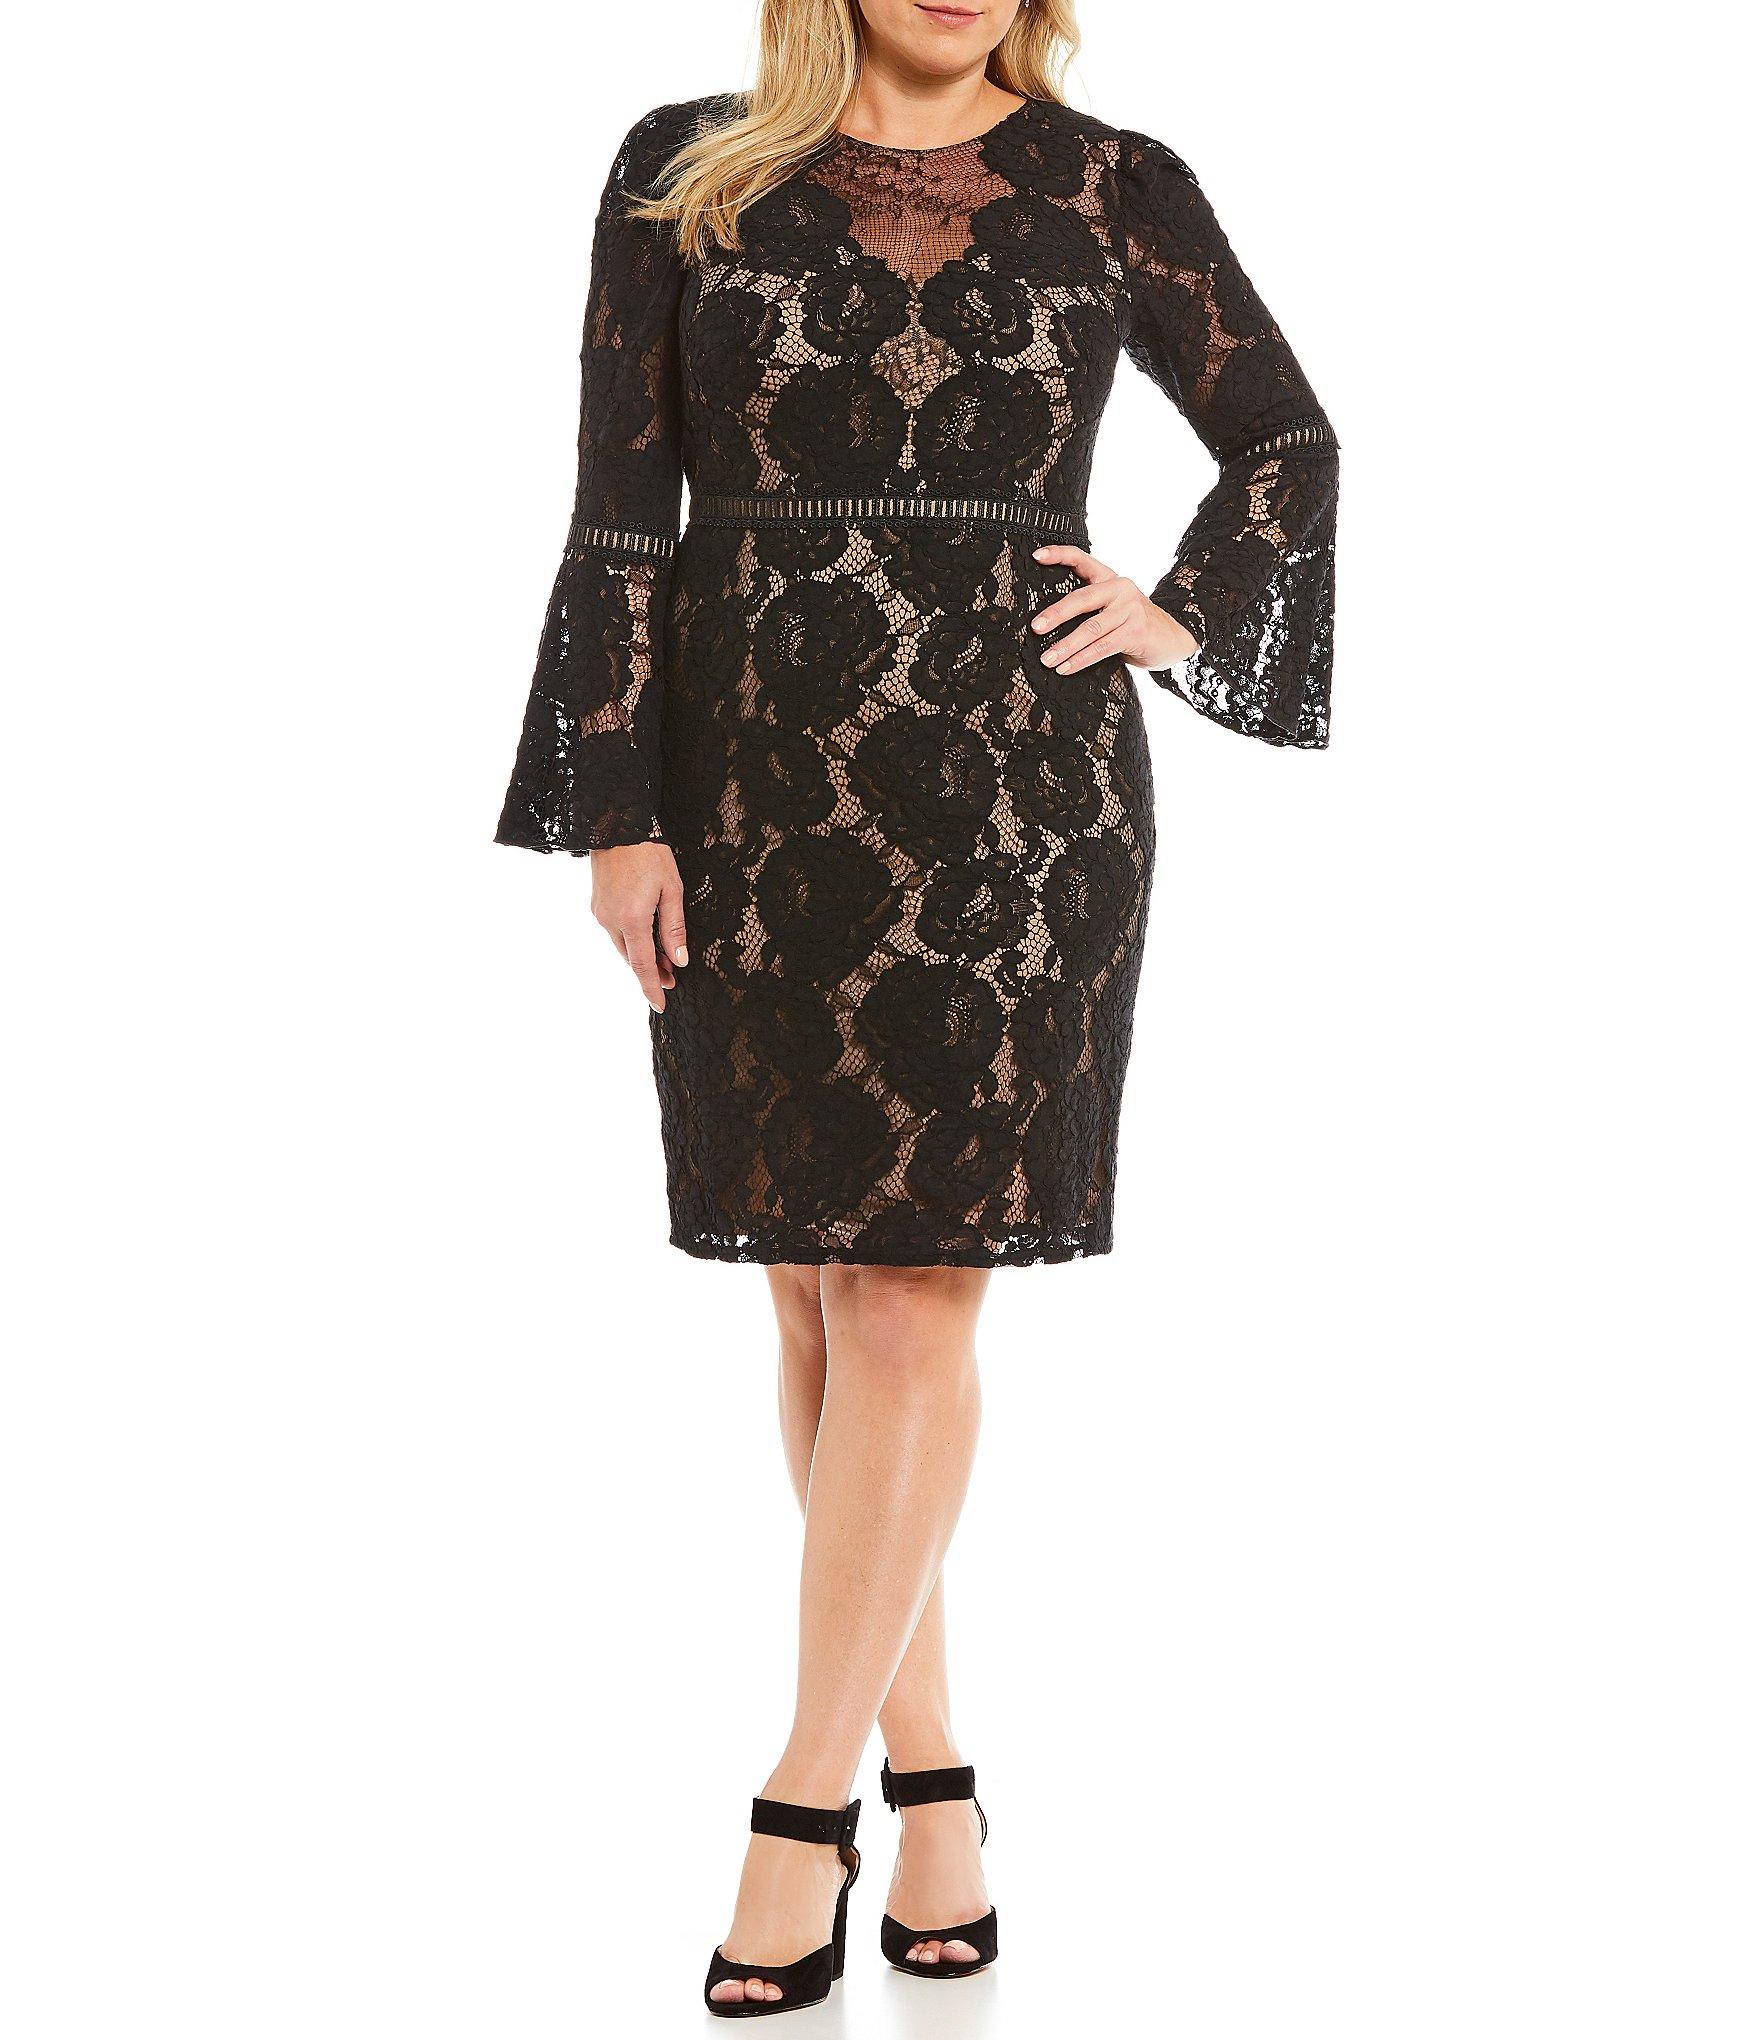 Lace cocktail dress dillards – Dresses dragon blog